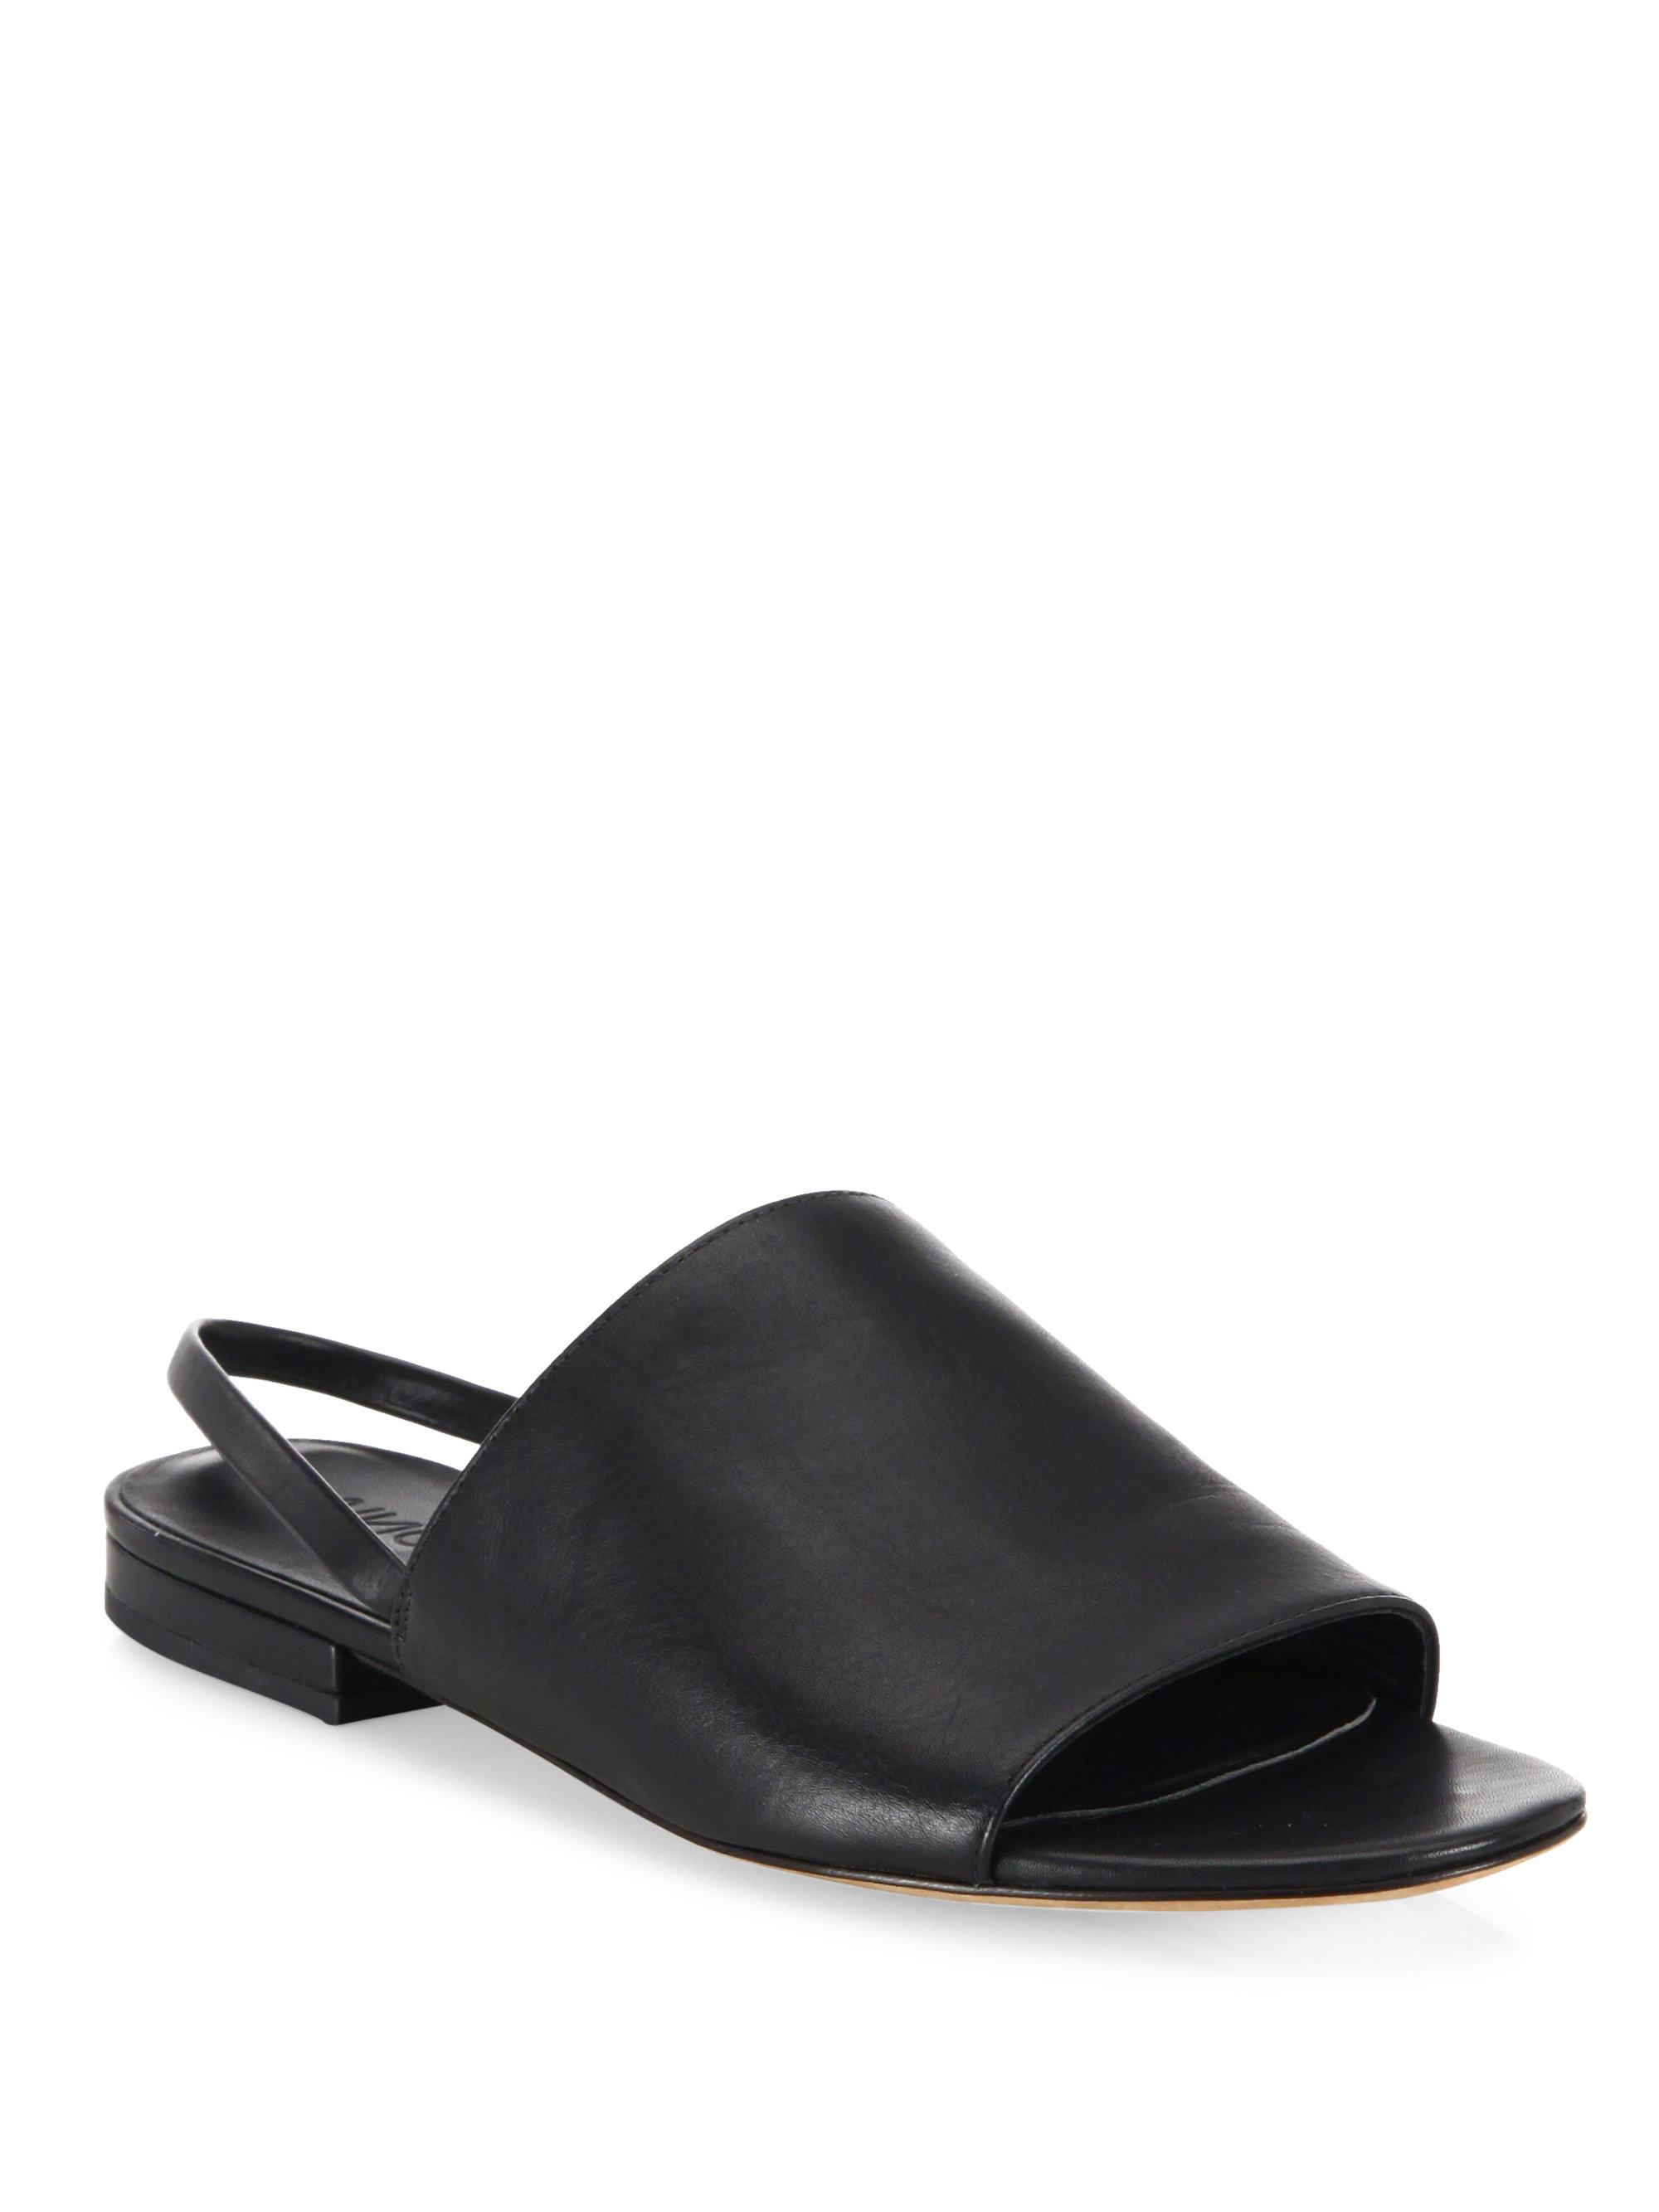 15ec7224357 Lyst - Vince Dawson Leather Flat Slingback Slides in Black